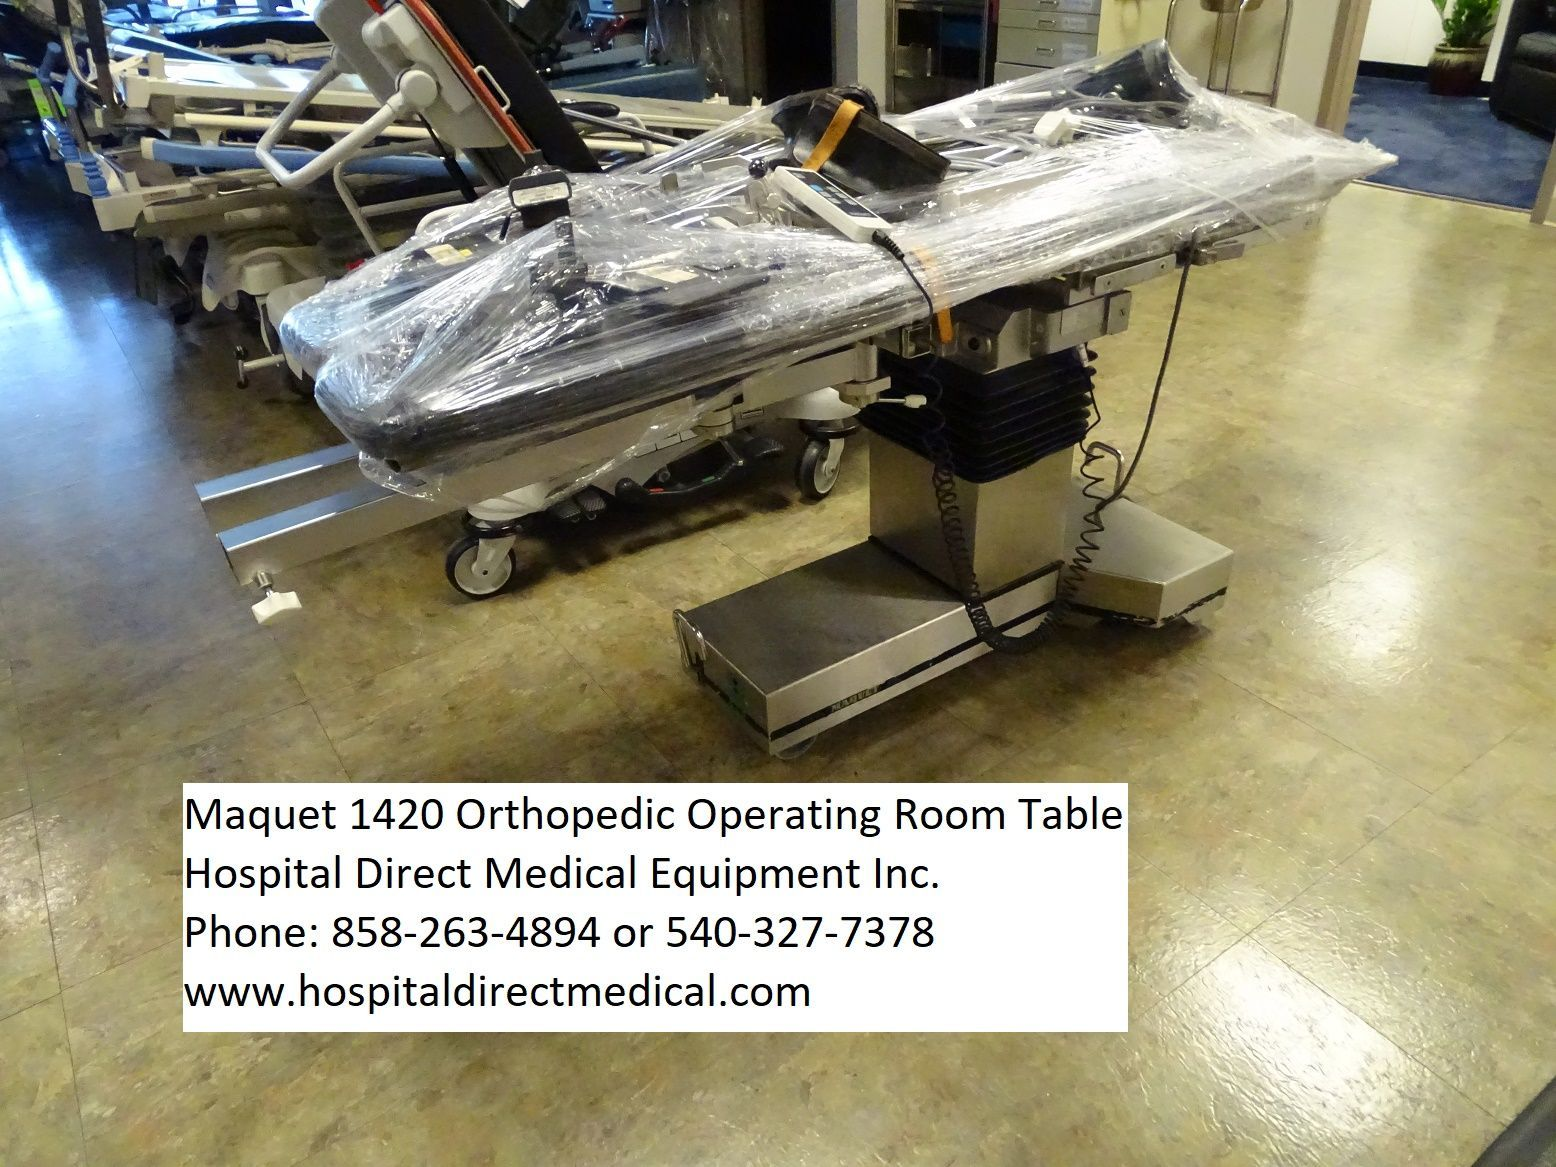 Typical Medical Equipment Shops #medicallife